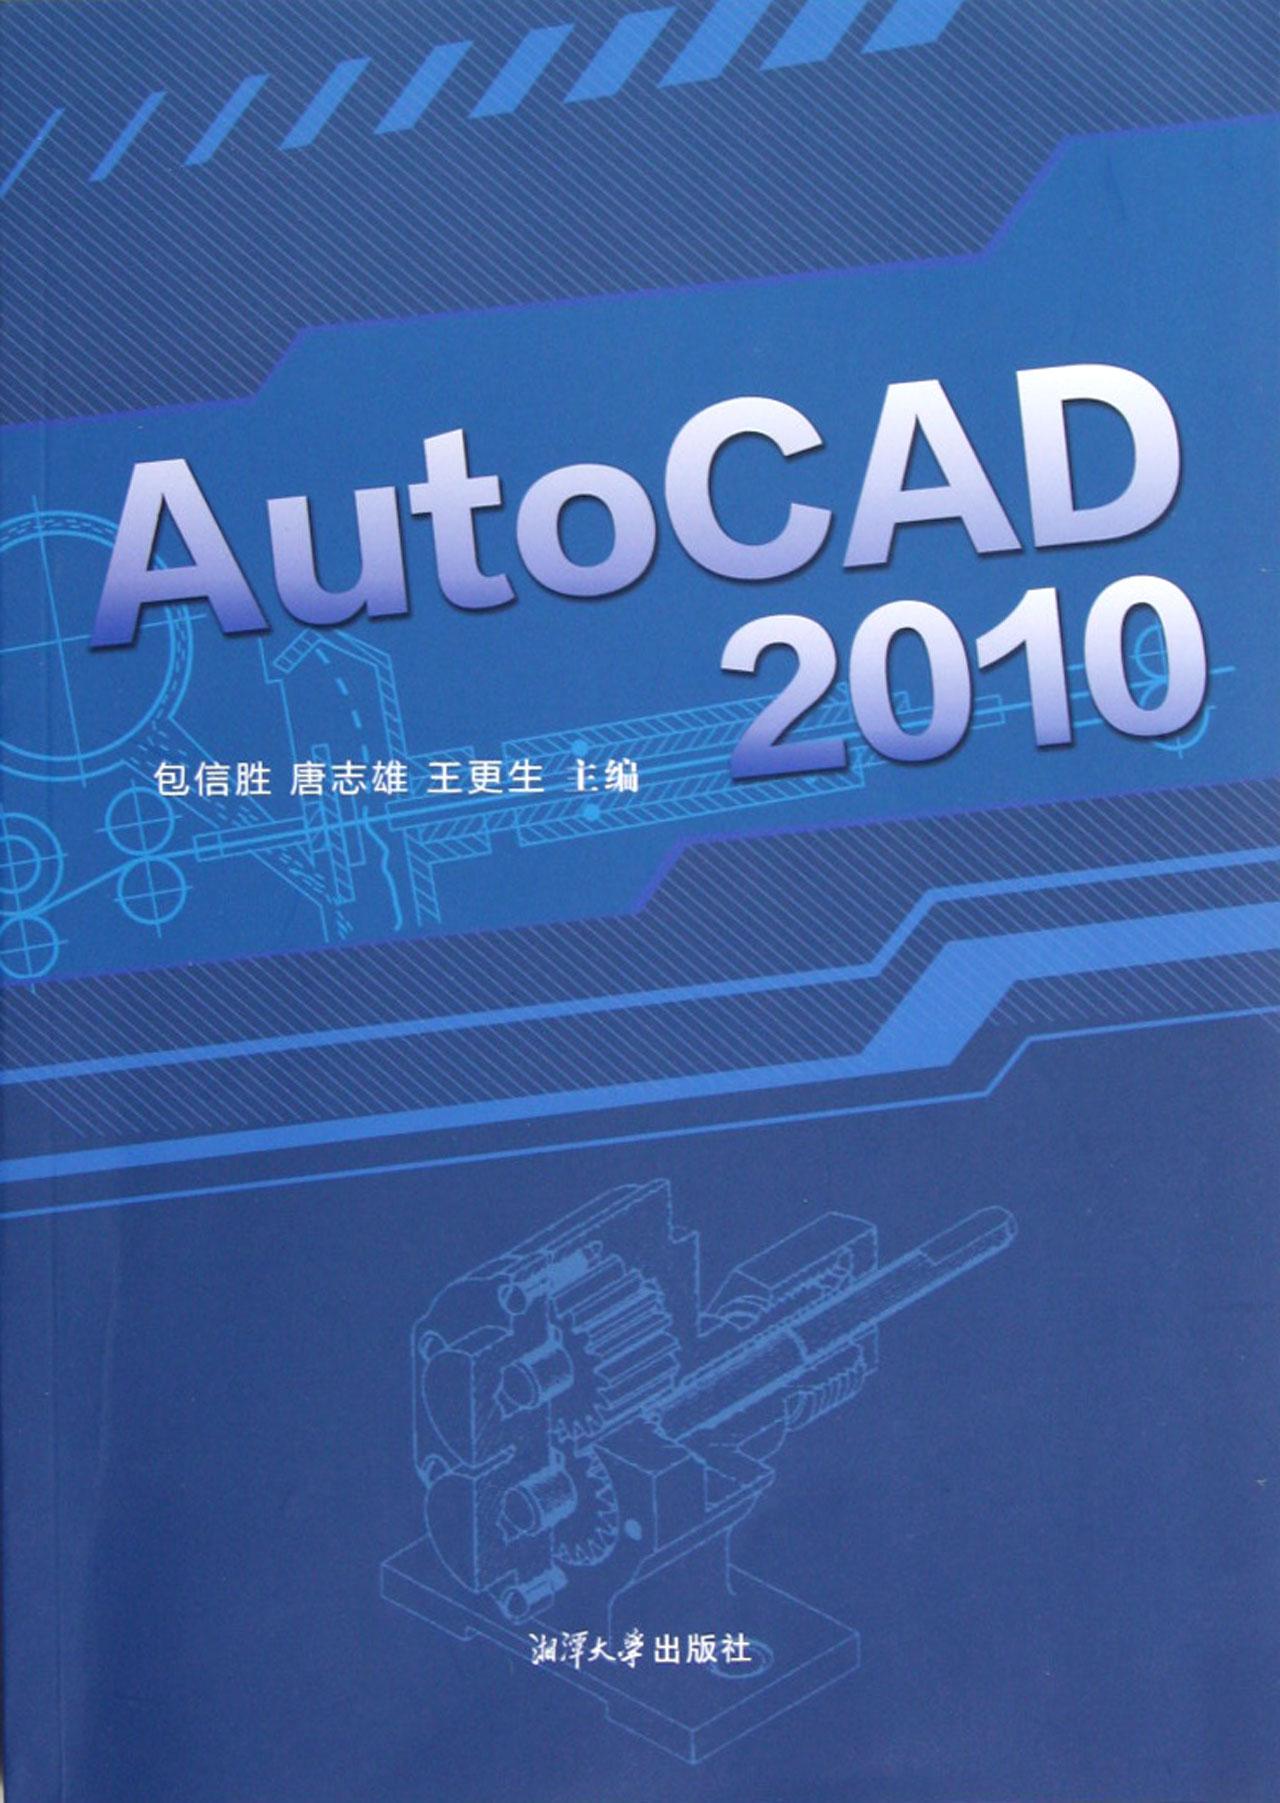 autocad00中文版_autocad2010版好用吗